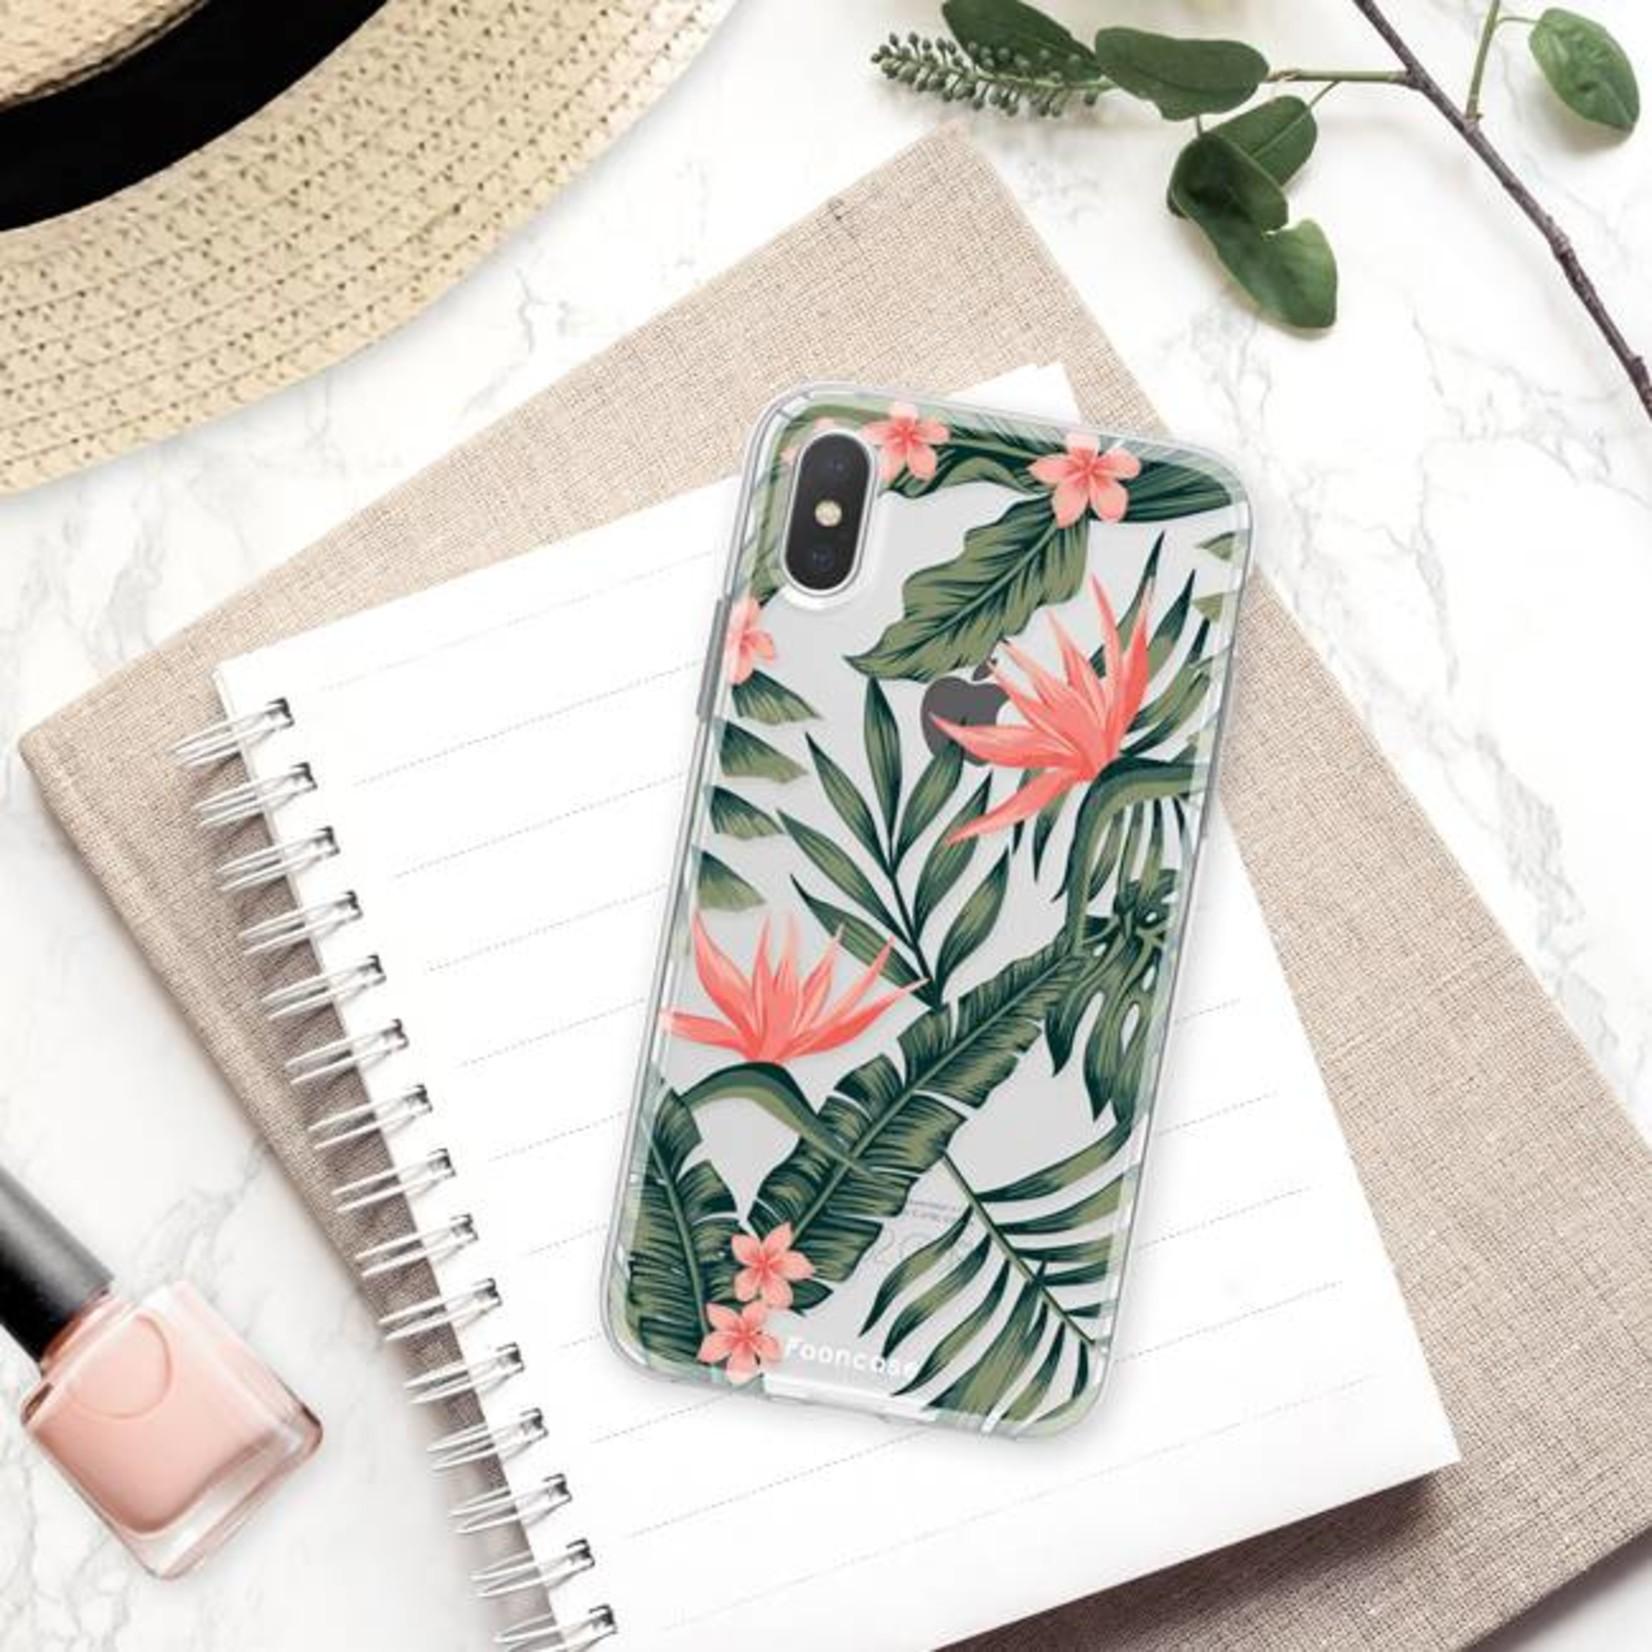 FOONCASE iPhone X hoesje TPU Soft Case - Back Cover - Tropical Desire / Bladeren / Roze